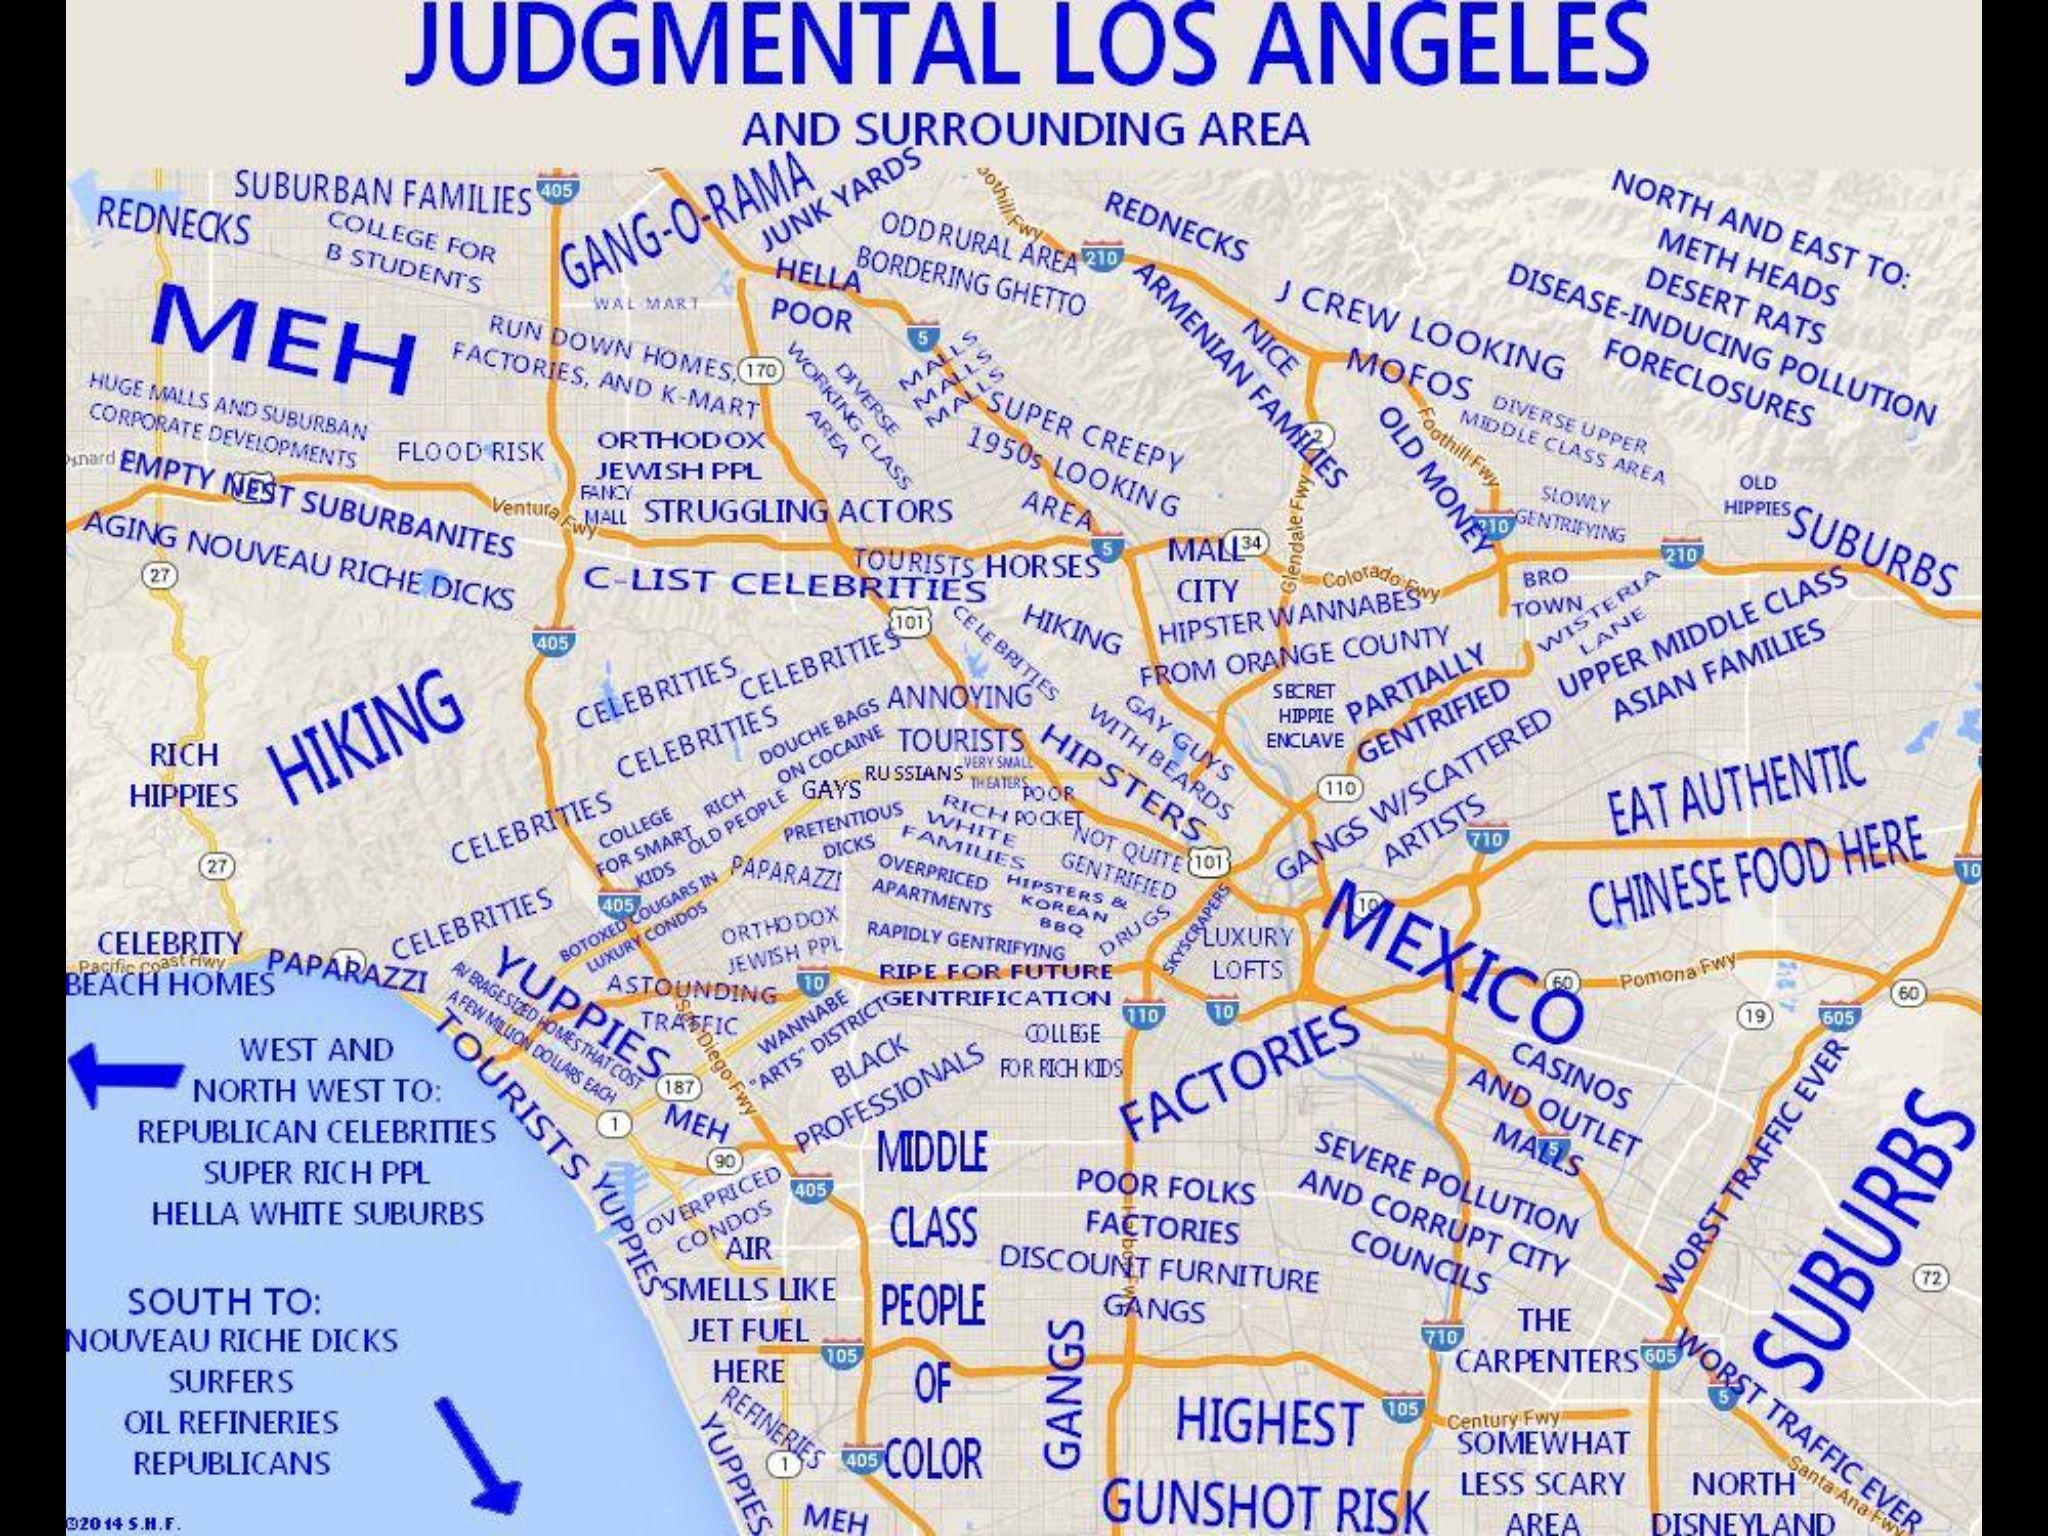 Judgemental Losangeles Los Angeles Map Map Los Angeles